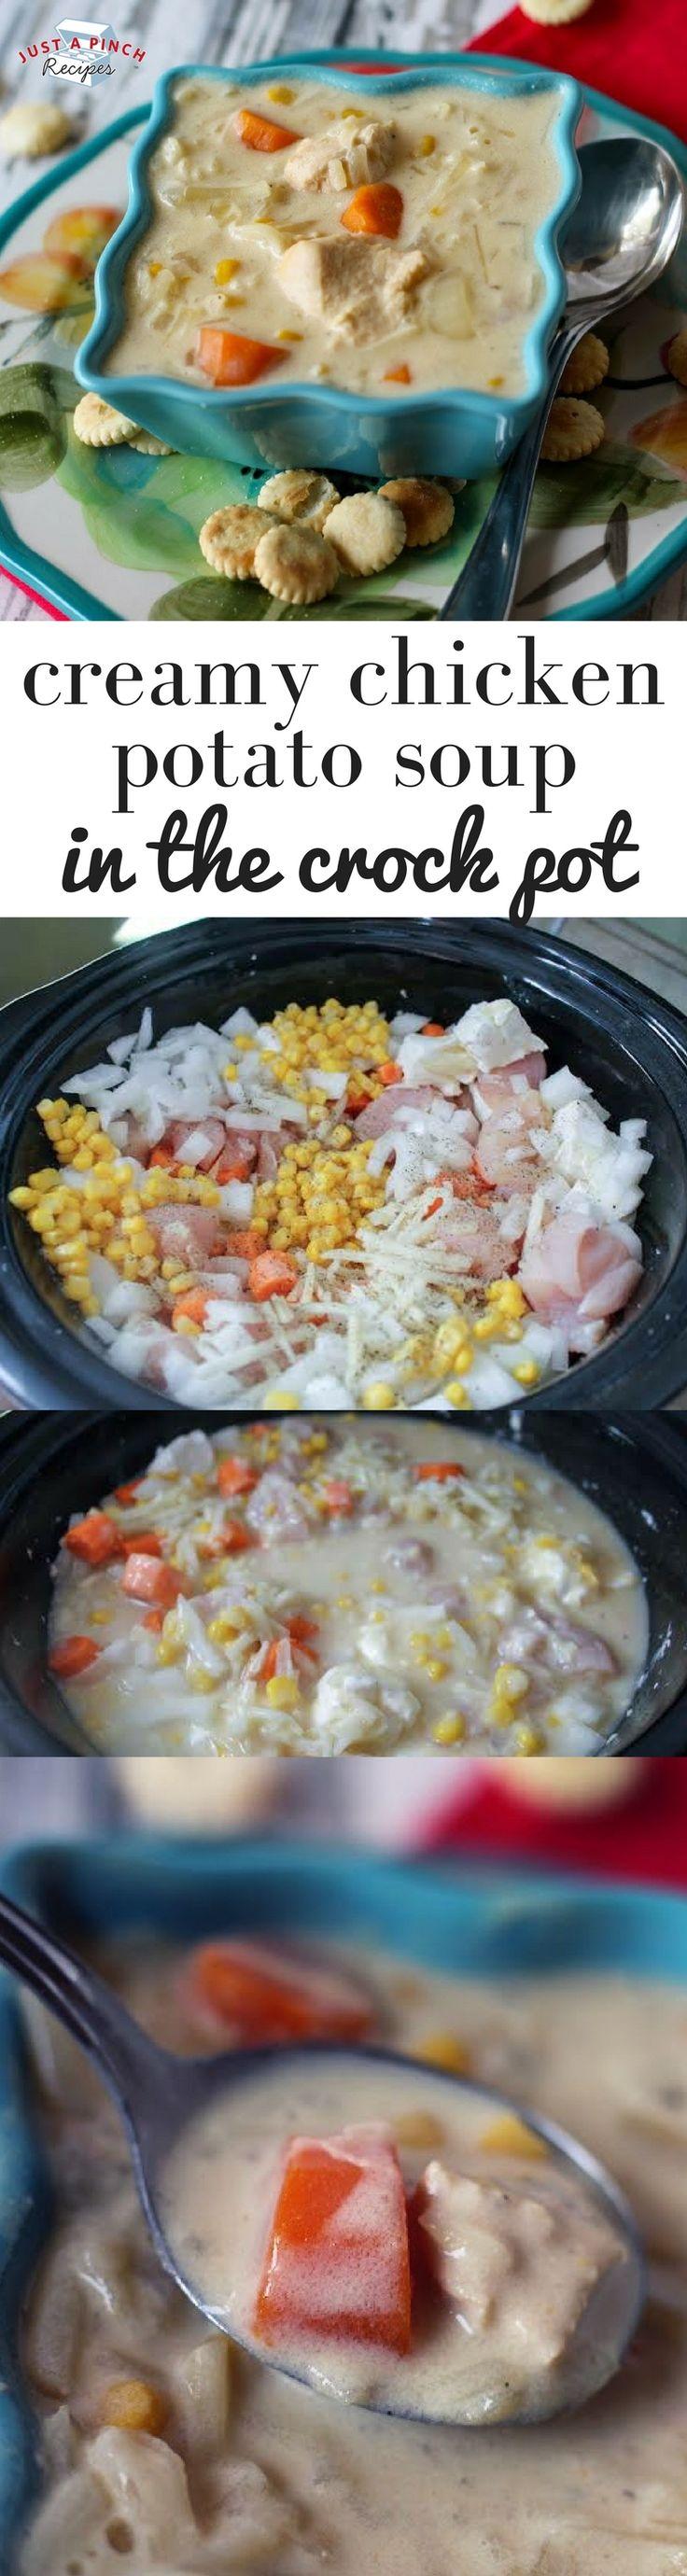 Easy creamy chicken potato soup in the crock pot recipe #crockpotrecipes #crockpotsoup #dinnerrecipes #dinnertime #comfortfood